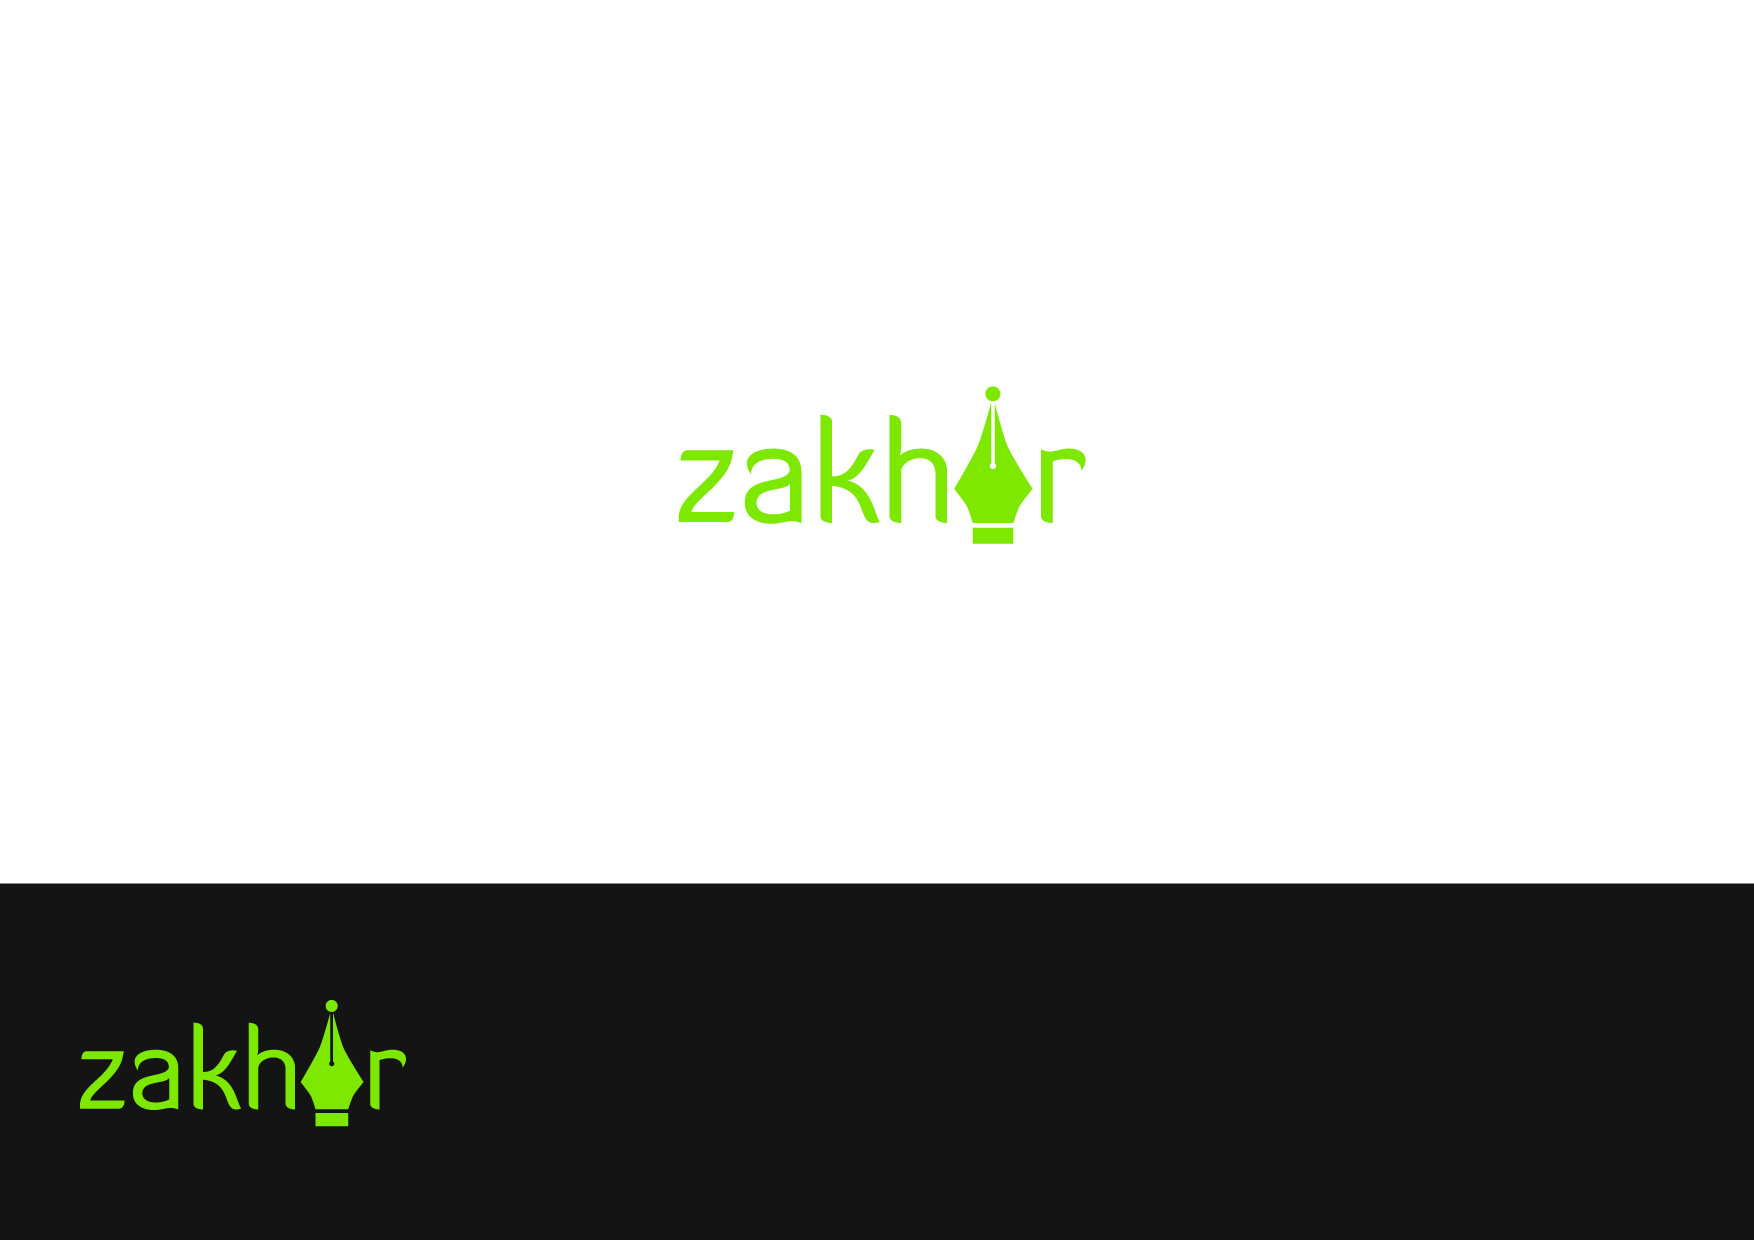 Logo Design by Osi Indra - Entry No. 6 in the Logo Design Contest Zakhir Logo Design.